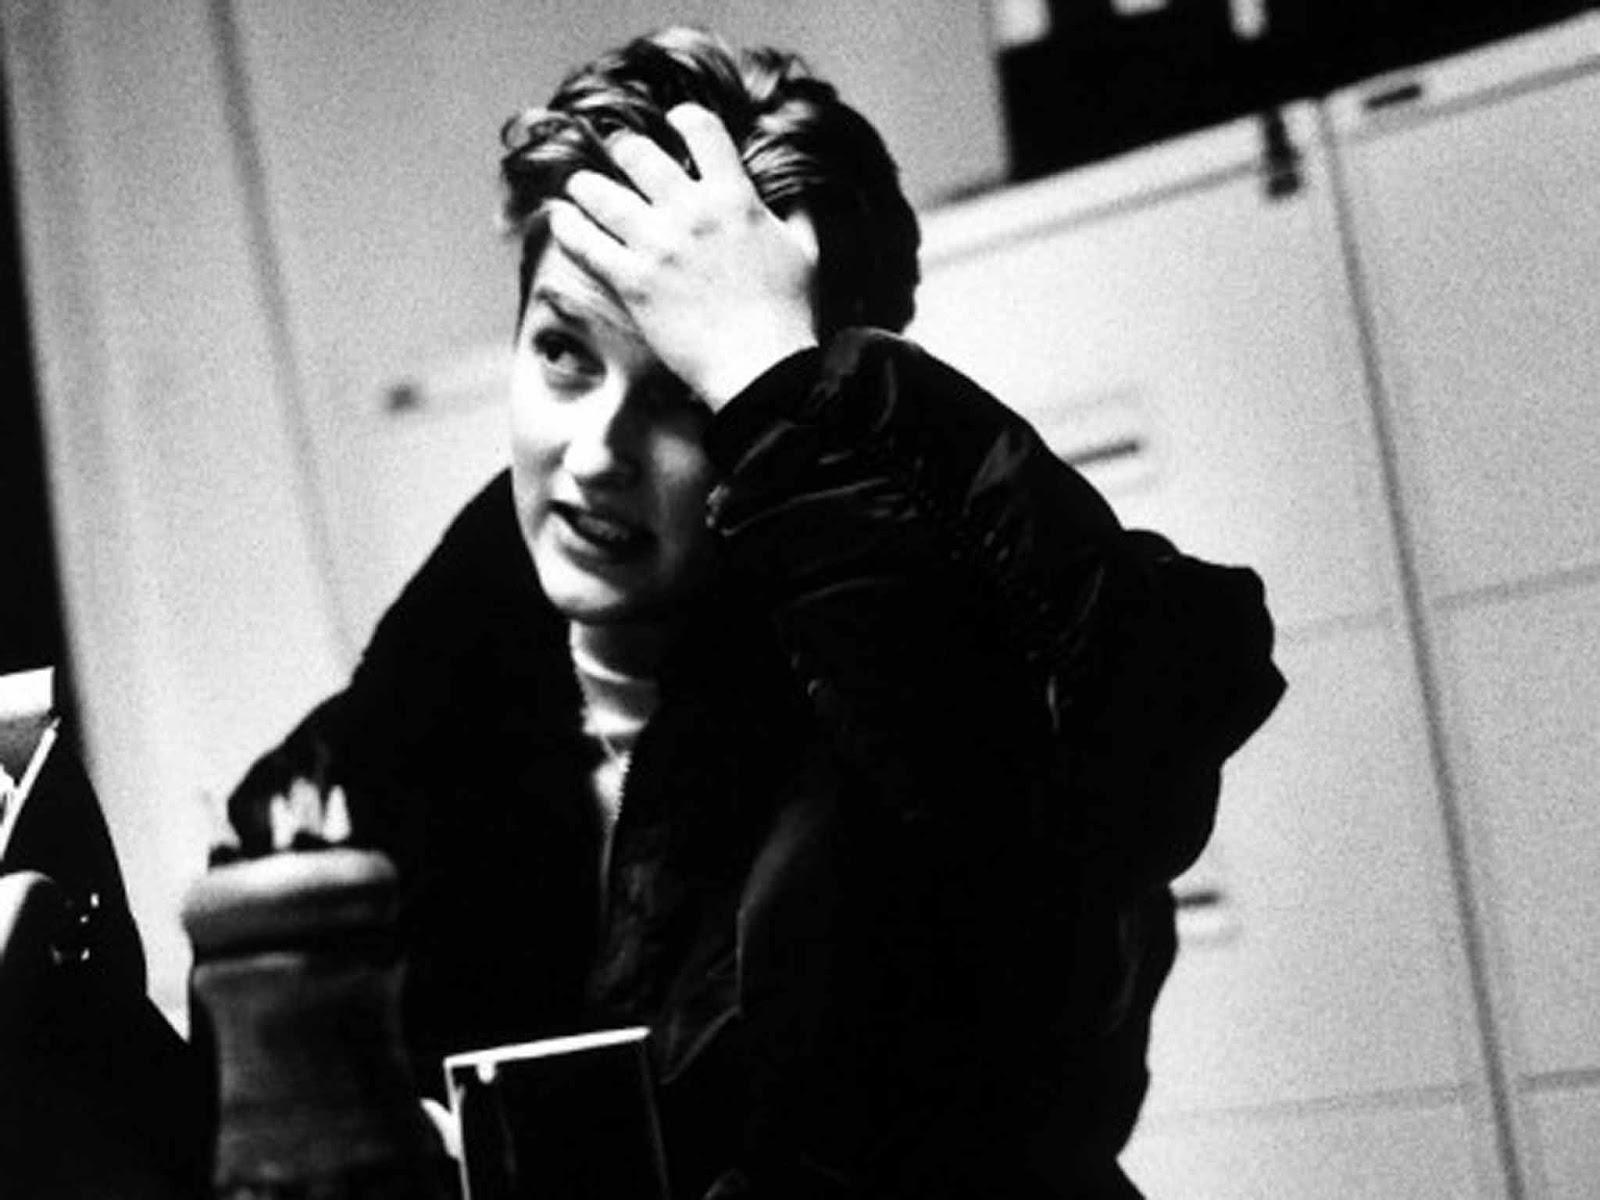 Glenn Ford,Jules de Jongh XXX gallery Andrea Brillantes (b. 2003),Cherie Lunghi